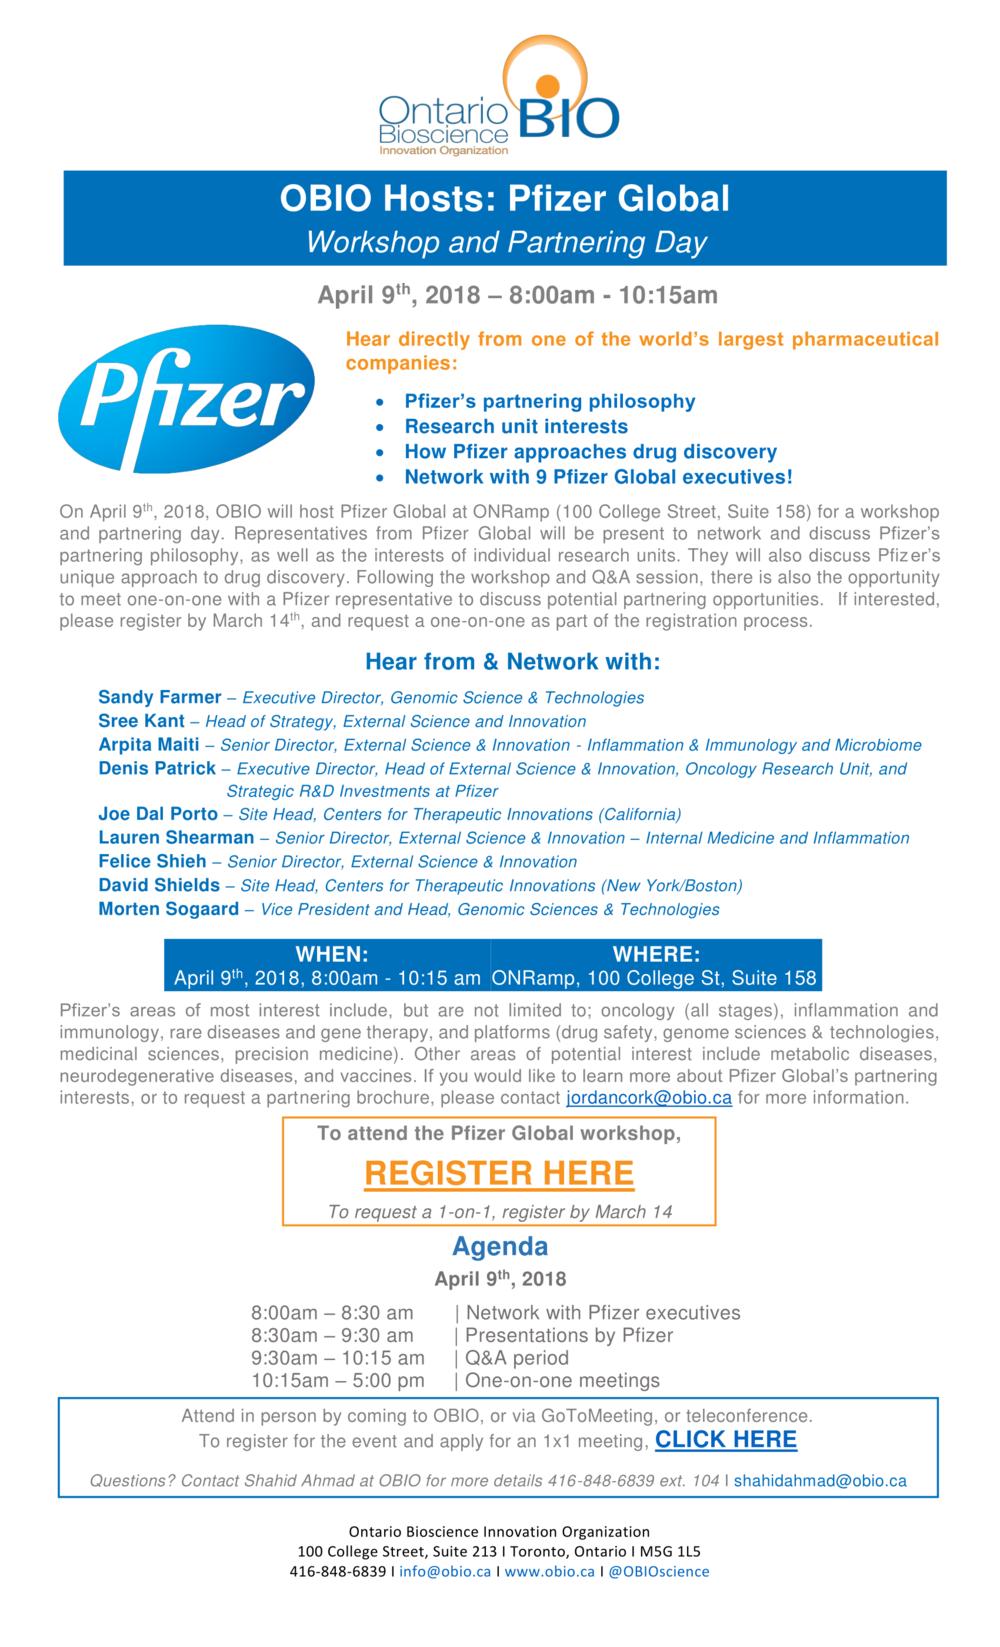 Pfizer Global Workshop and Partnering Day Flyer.png